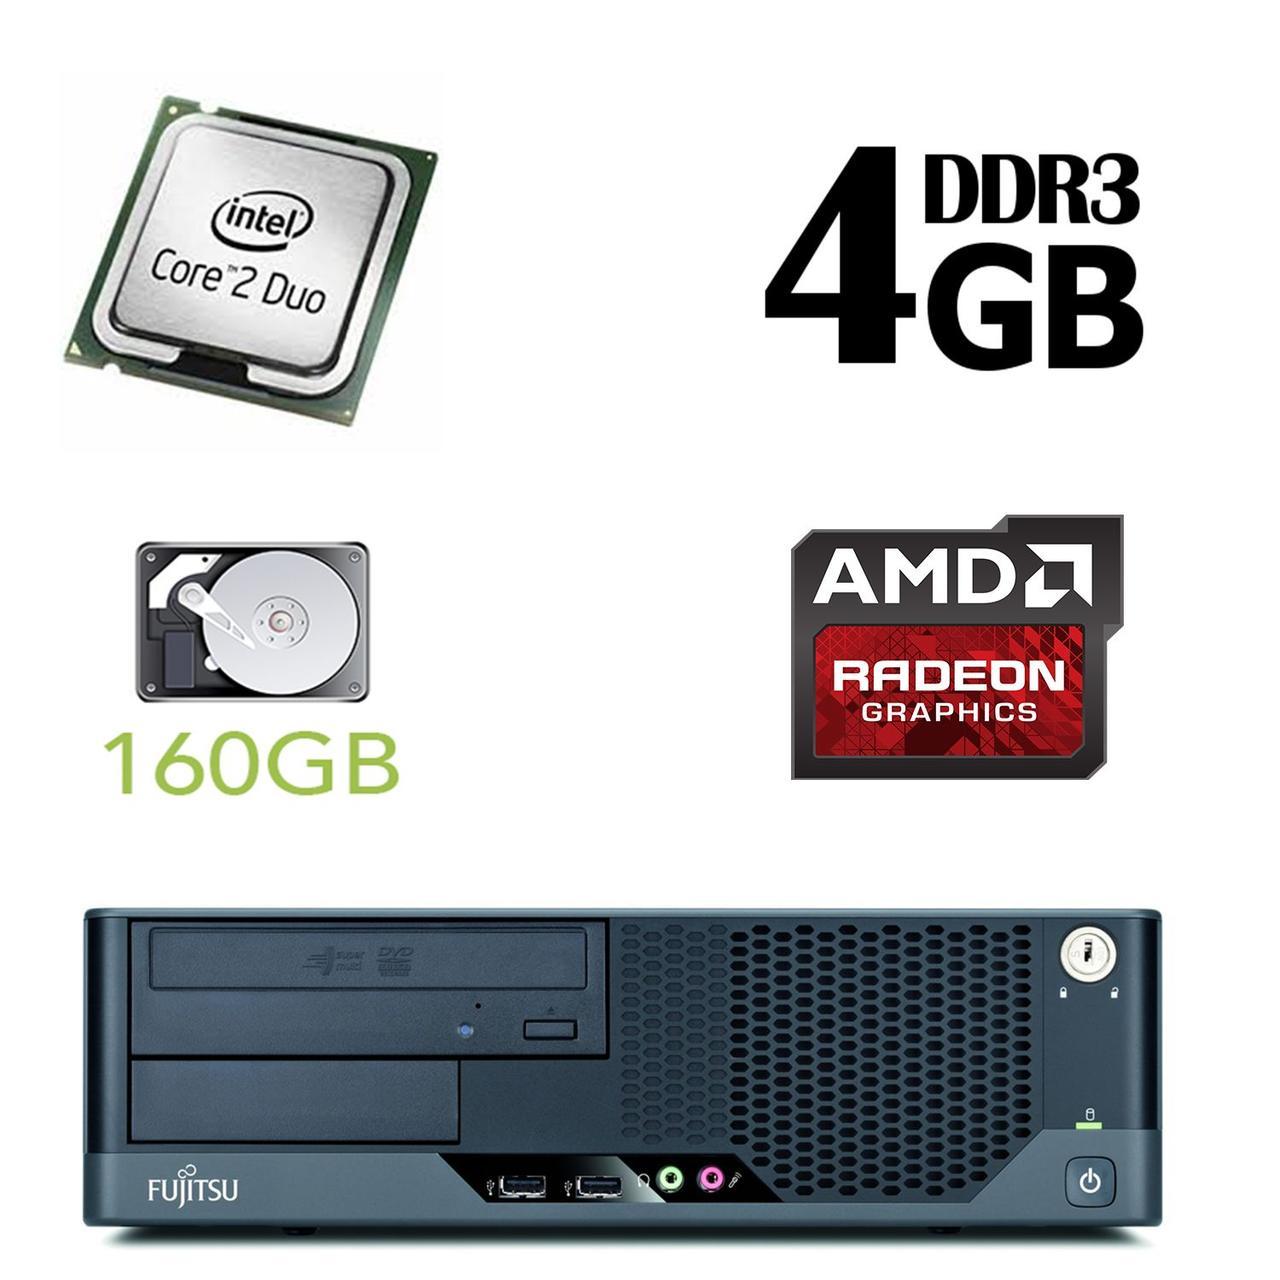 Fujitsu Esprimo E5731 SFF / Intel Core 2 Duo E7500 (2 ядра по 2.93GHz) / 4GB DDR3 / 160GB HDD / AMD Radeon HD 7570 1 GB GDDR5 128 bit